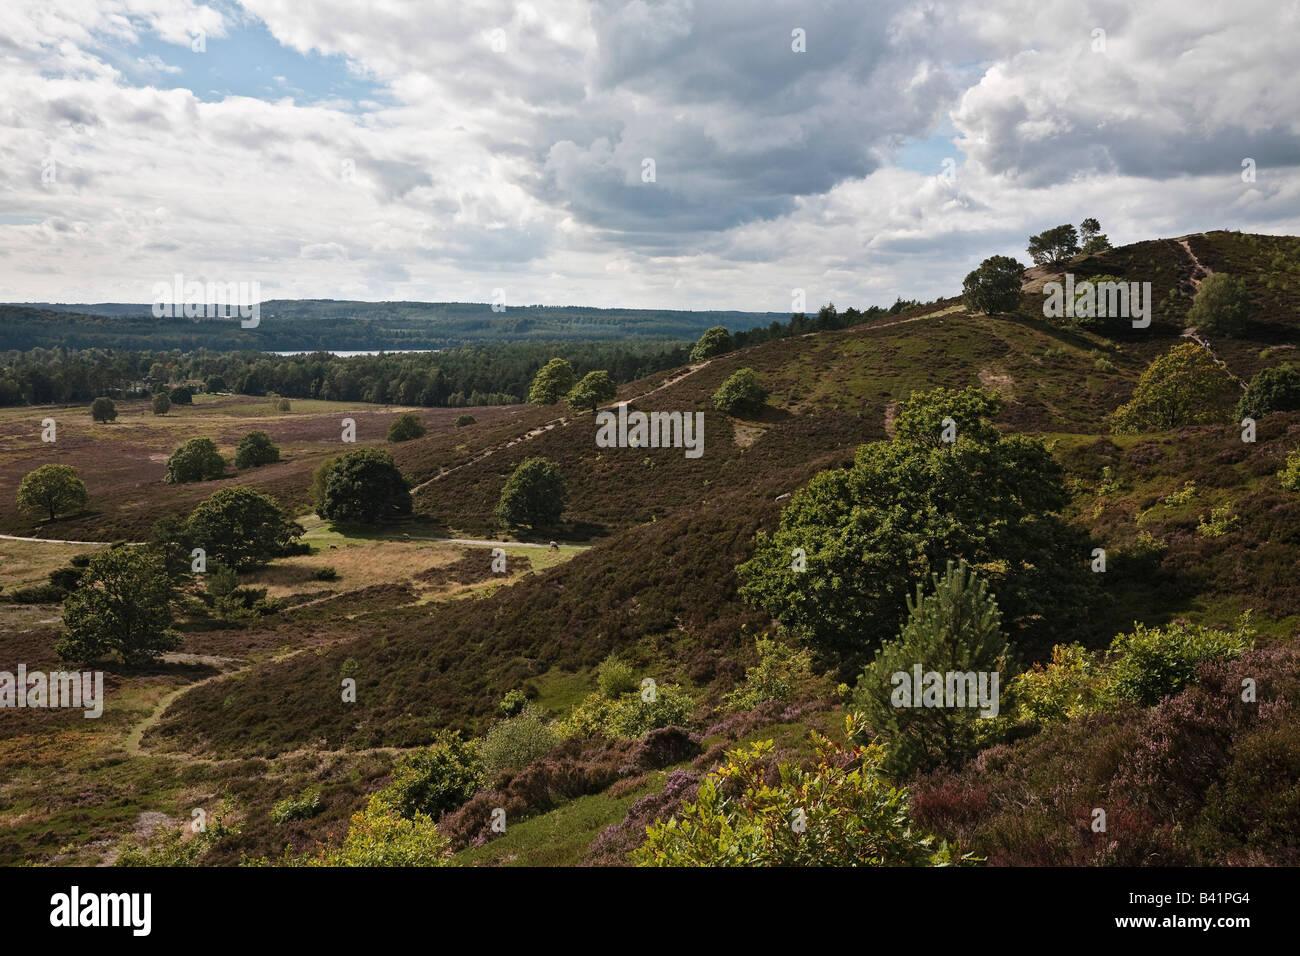 Stovbjerg hill and view to Sindbjerg hill and Lake Brassø, near Sejs, Jutland, Denmark - Stock Image